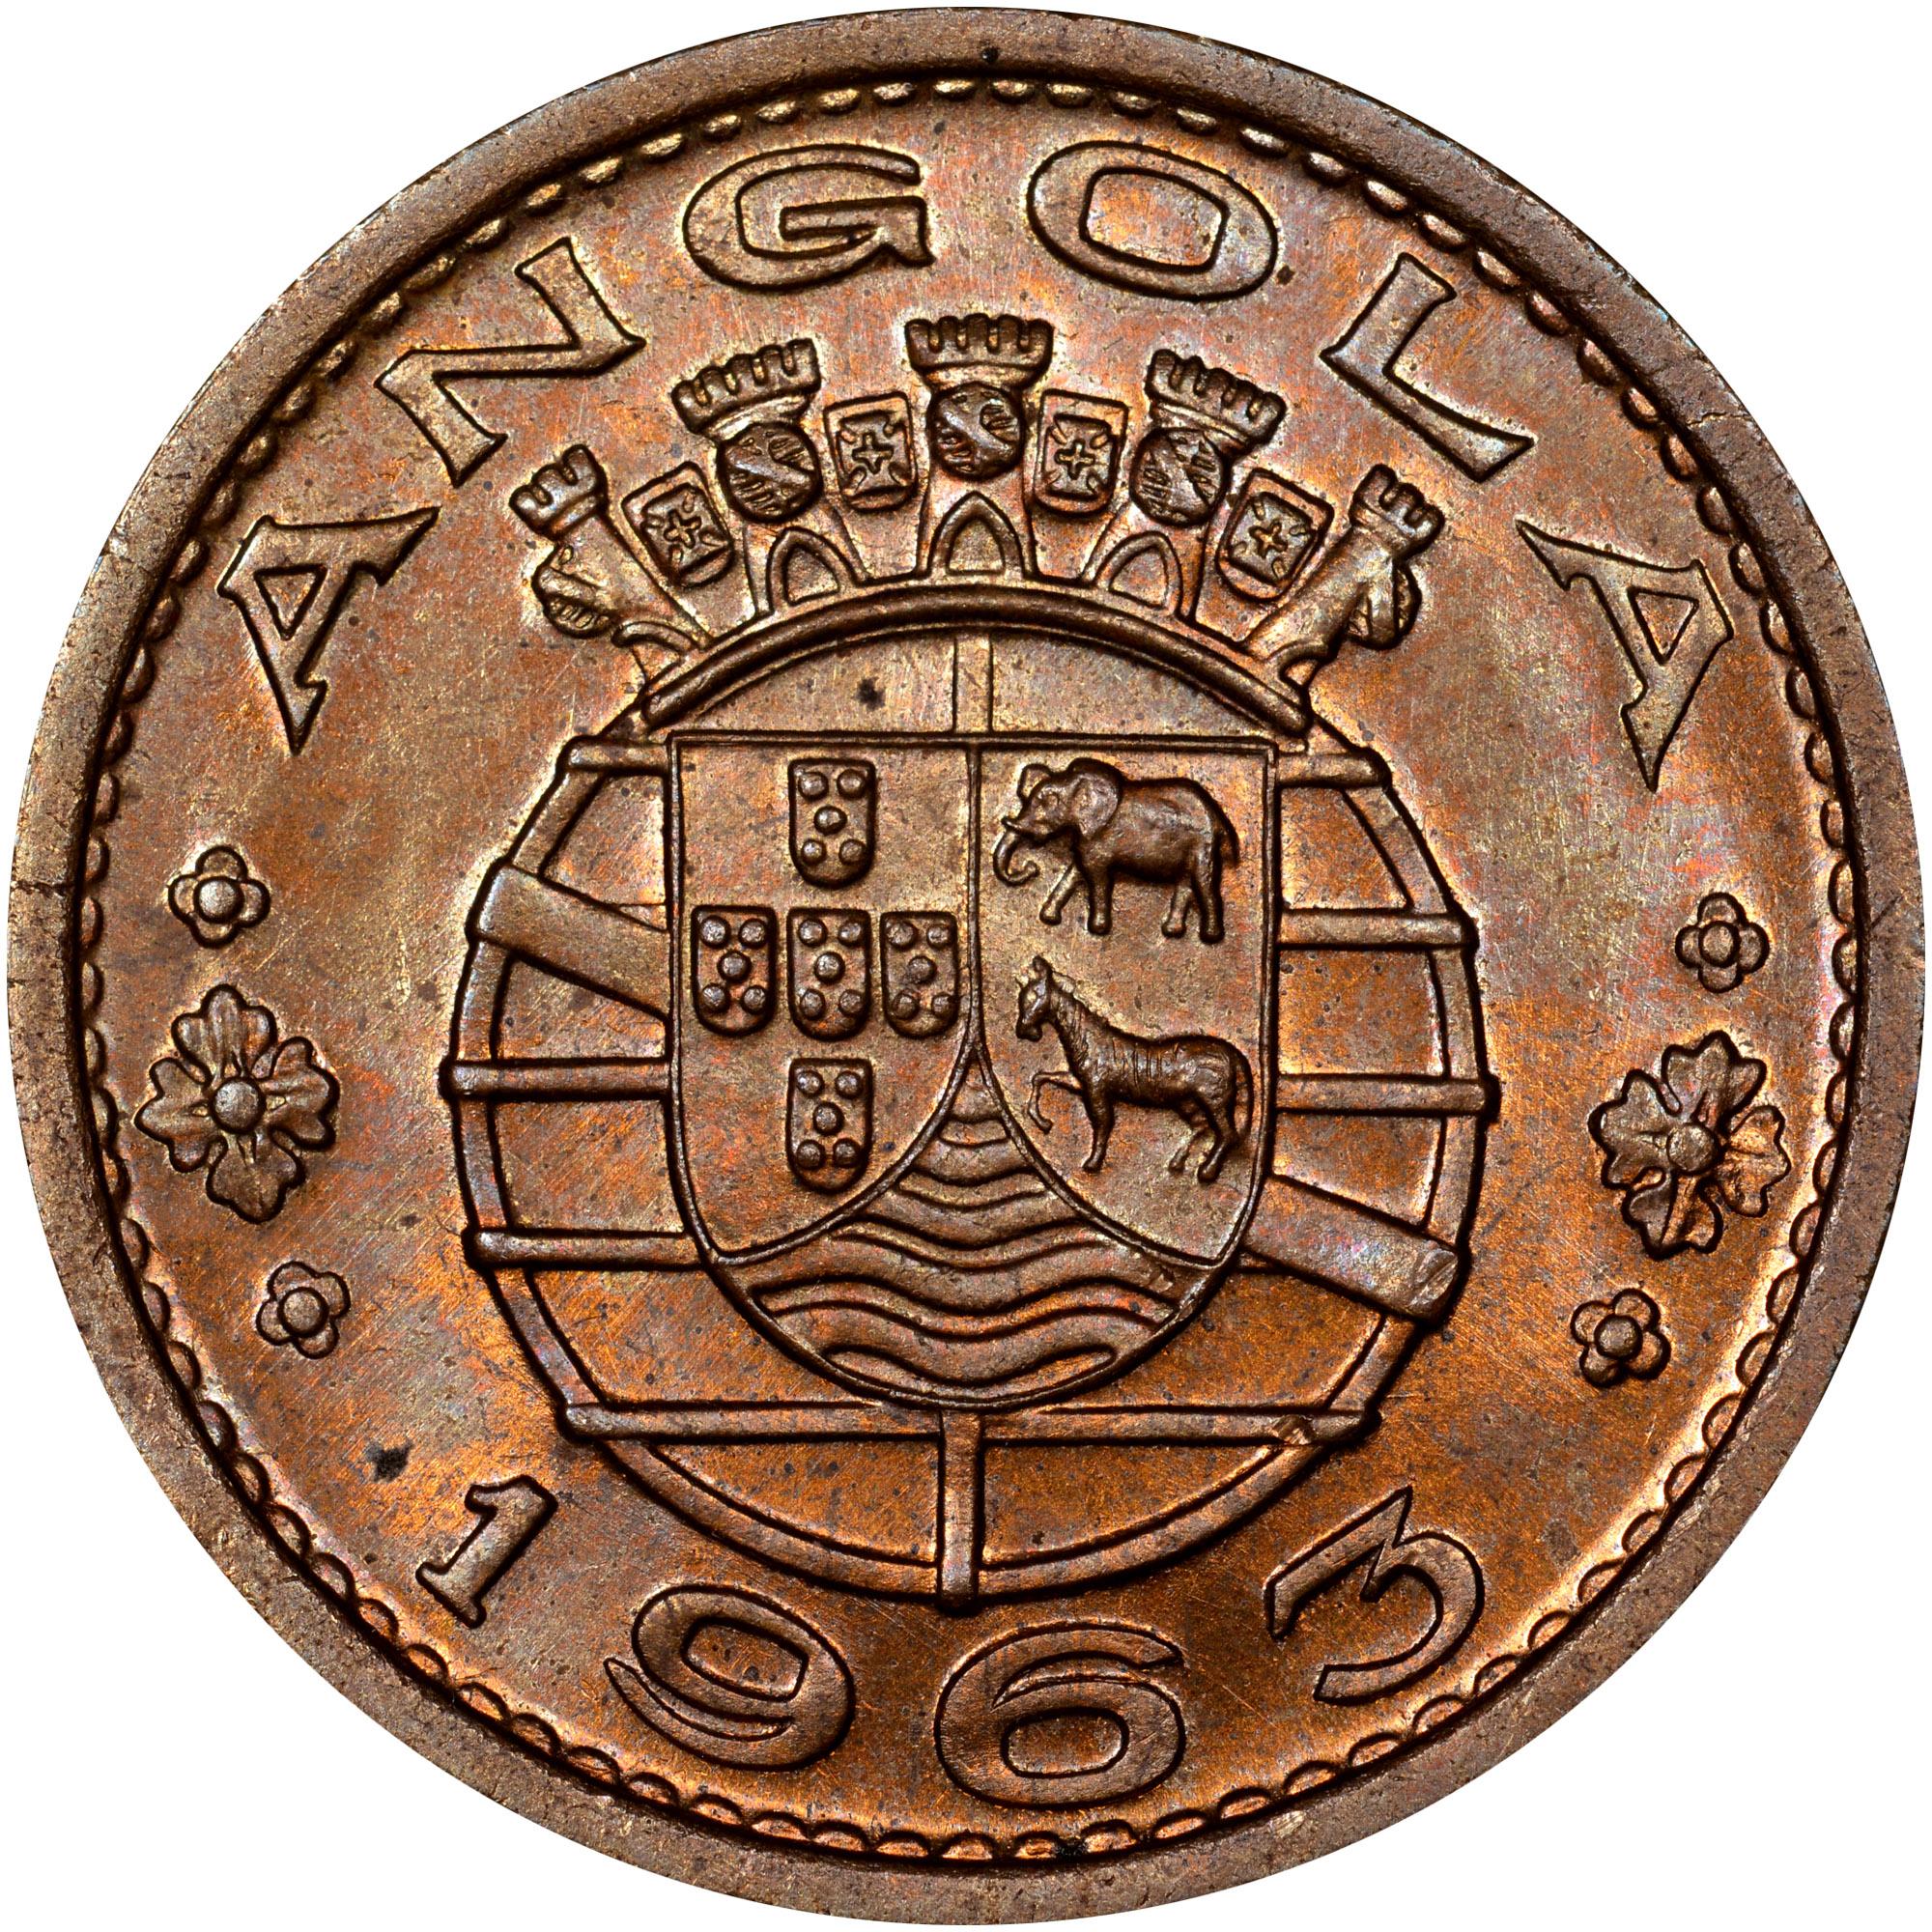 1963 Angola Escudo reverse